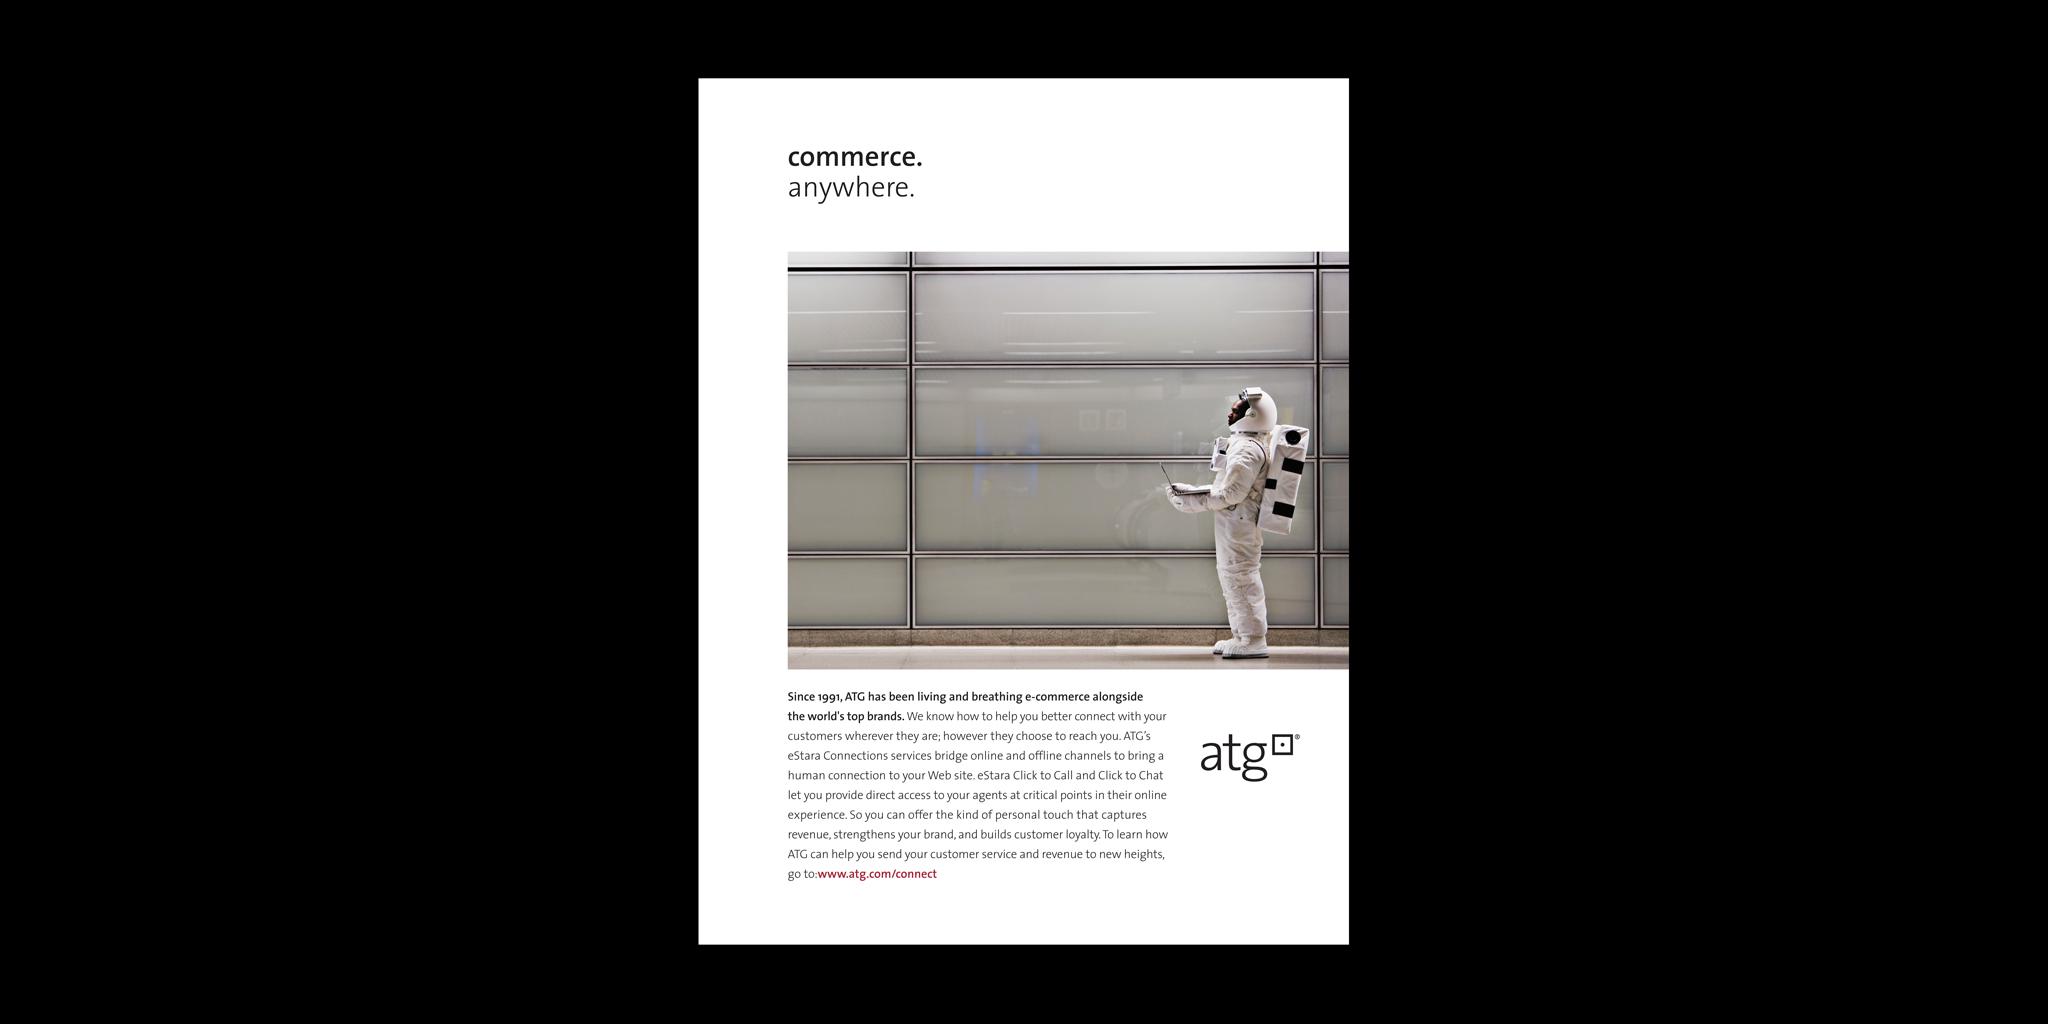 ATG_astronaut_ad_1024.jpg